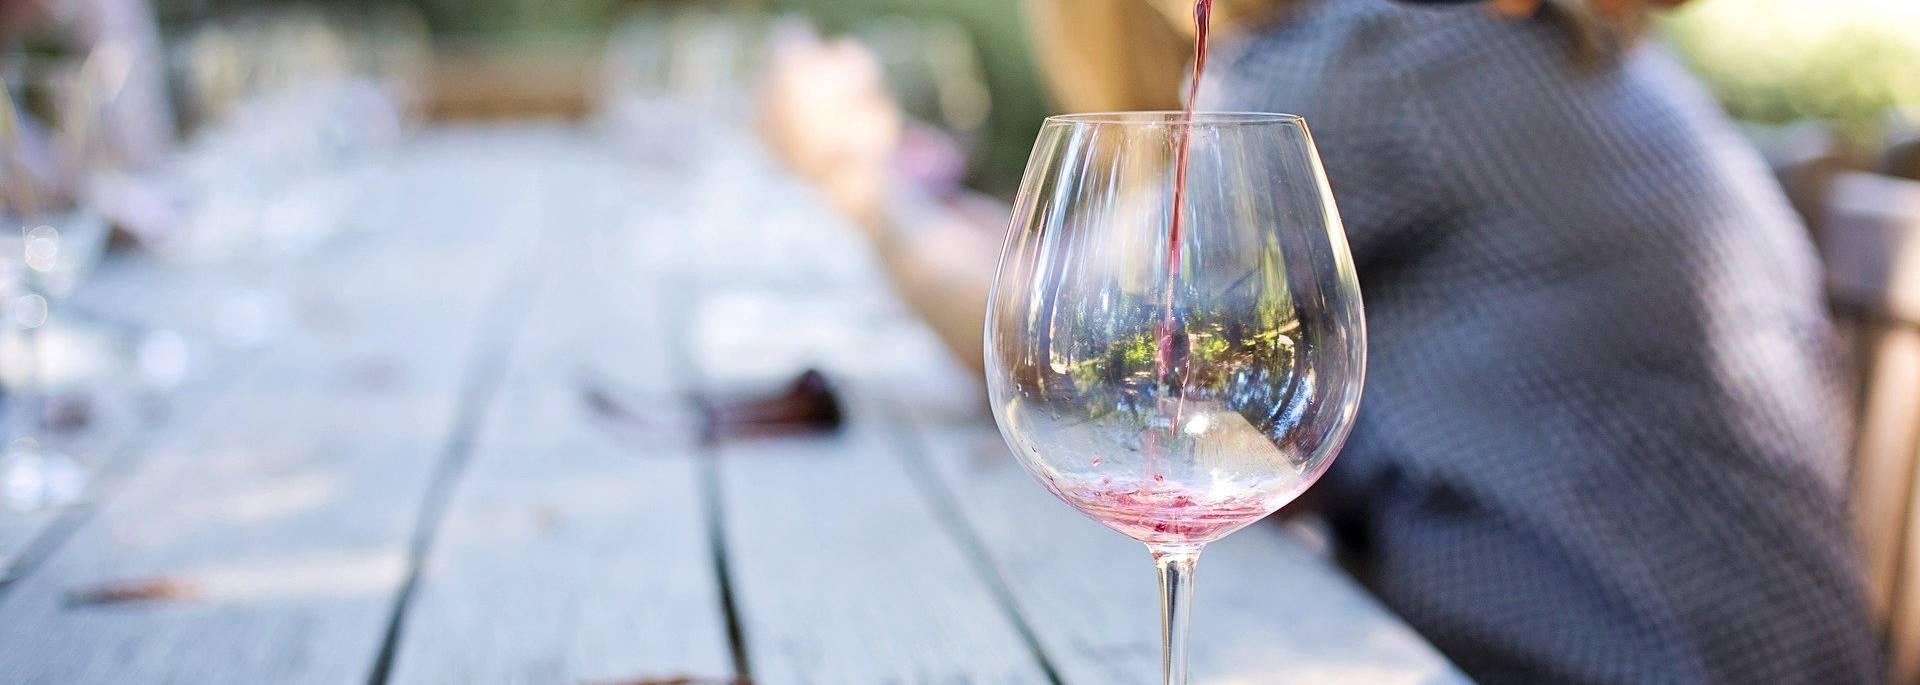 Domaine viticole, brasseur